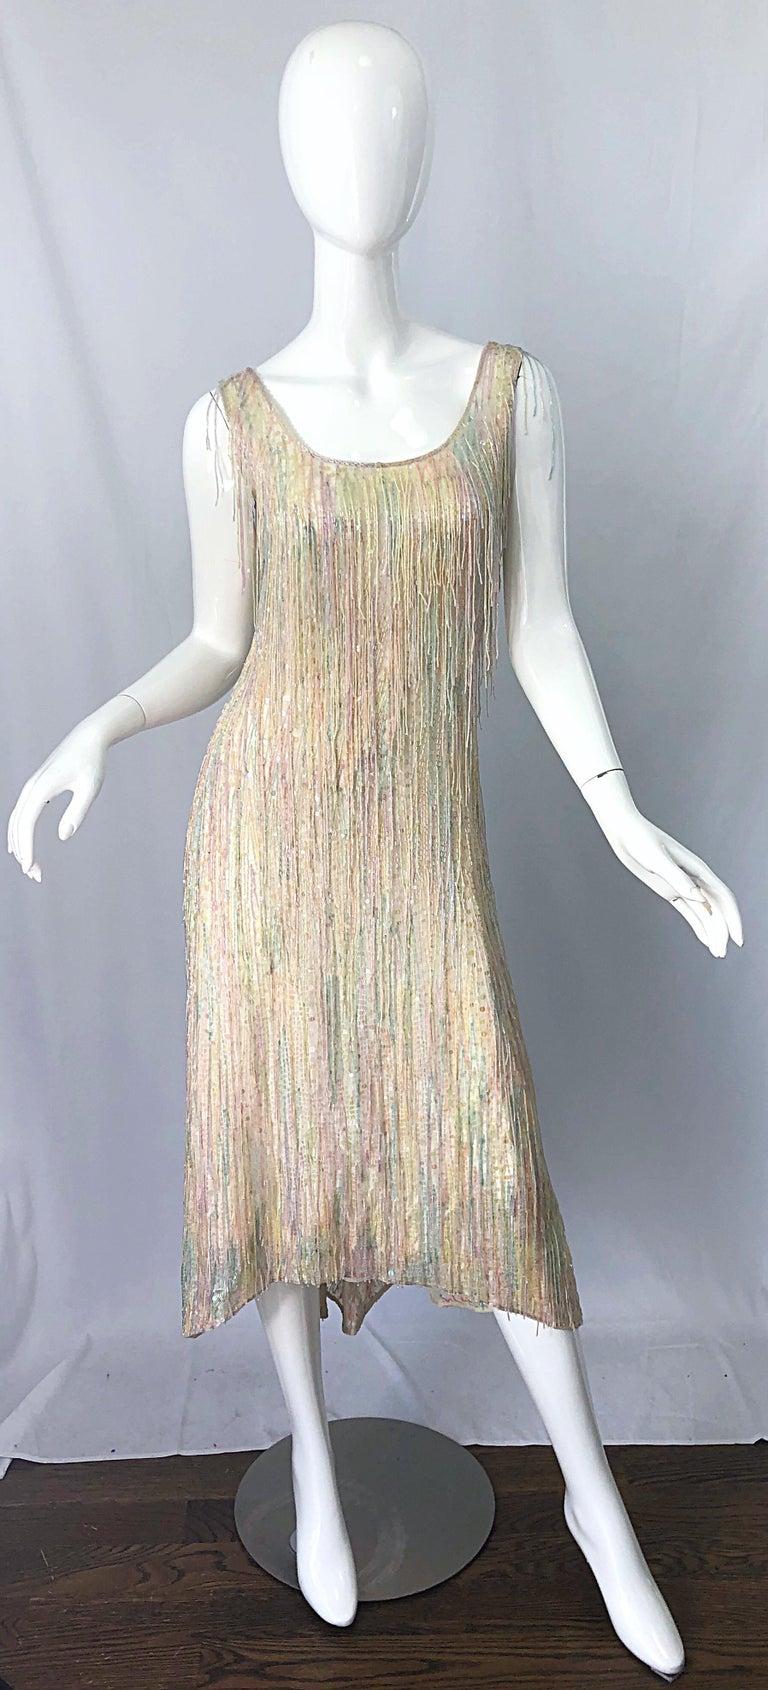 Halston MET Musuem 1970s Fully Fringed Beaded Flapper Style Vintage 70s Dress For Sale 5